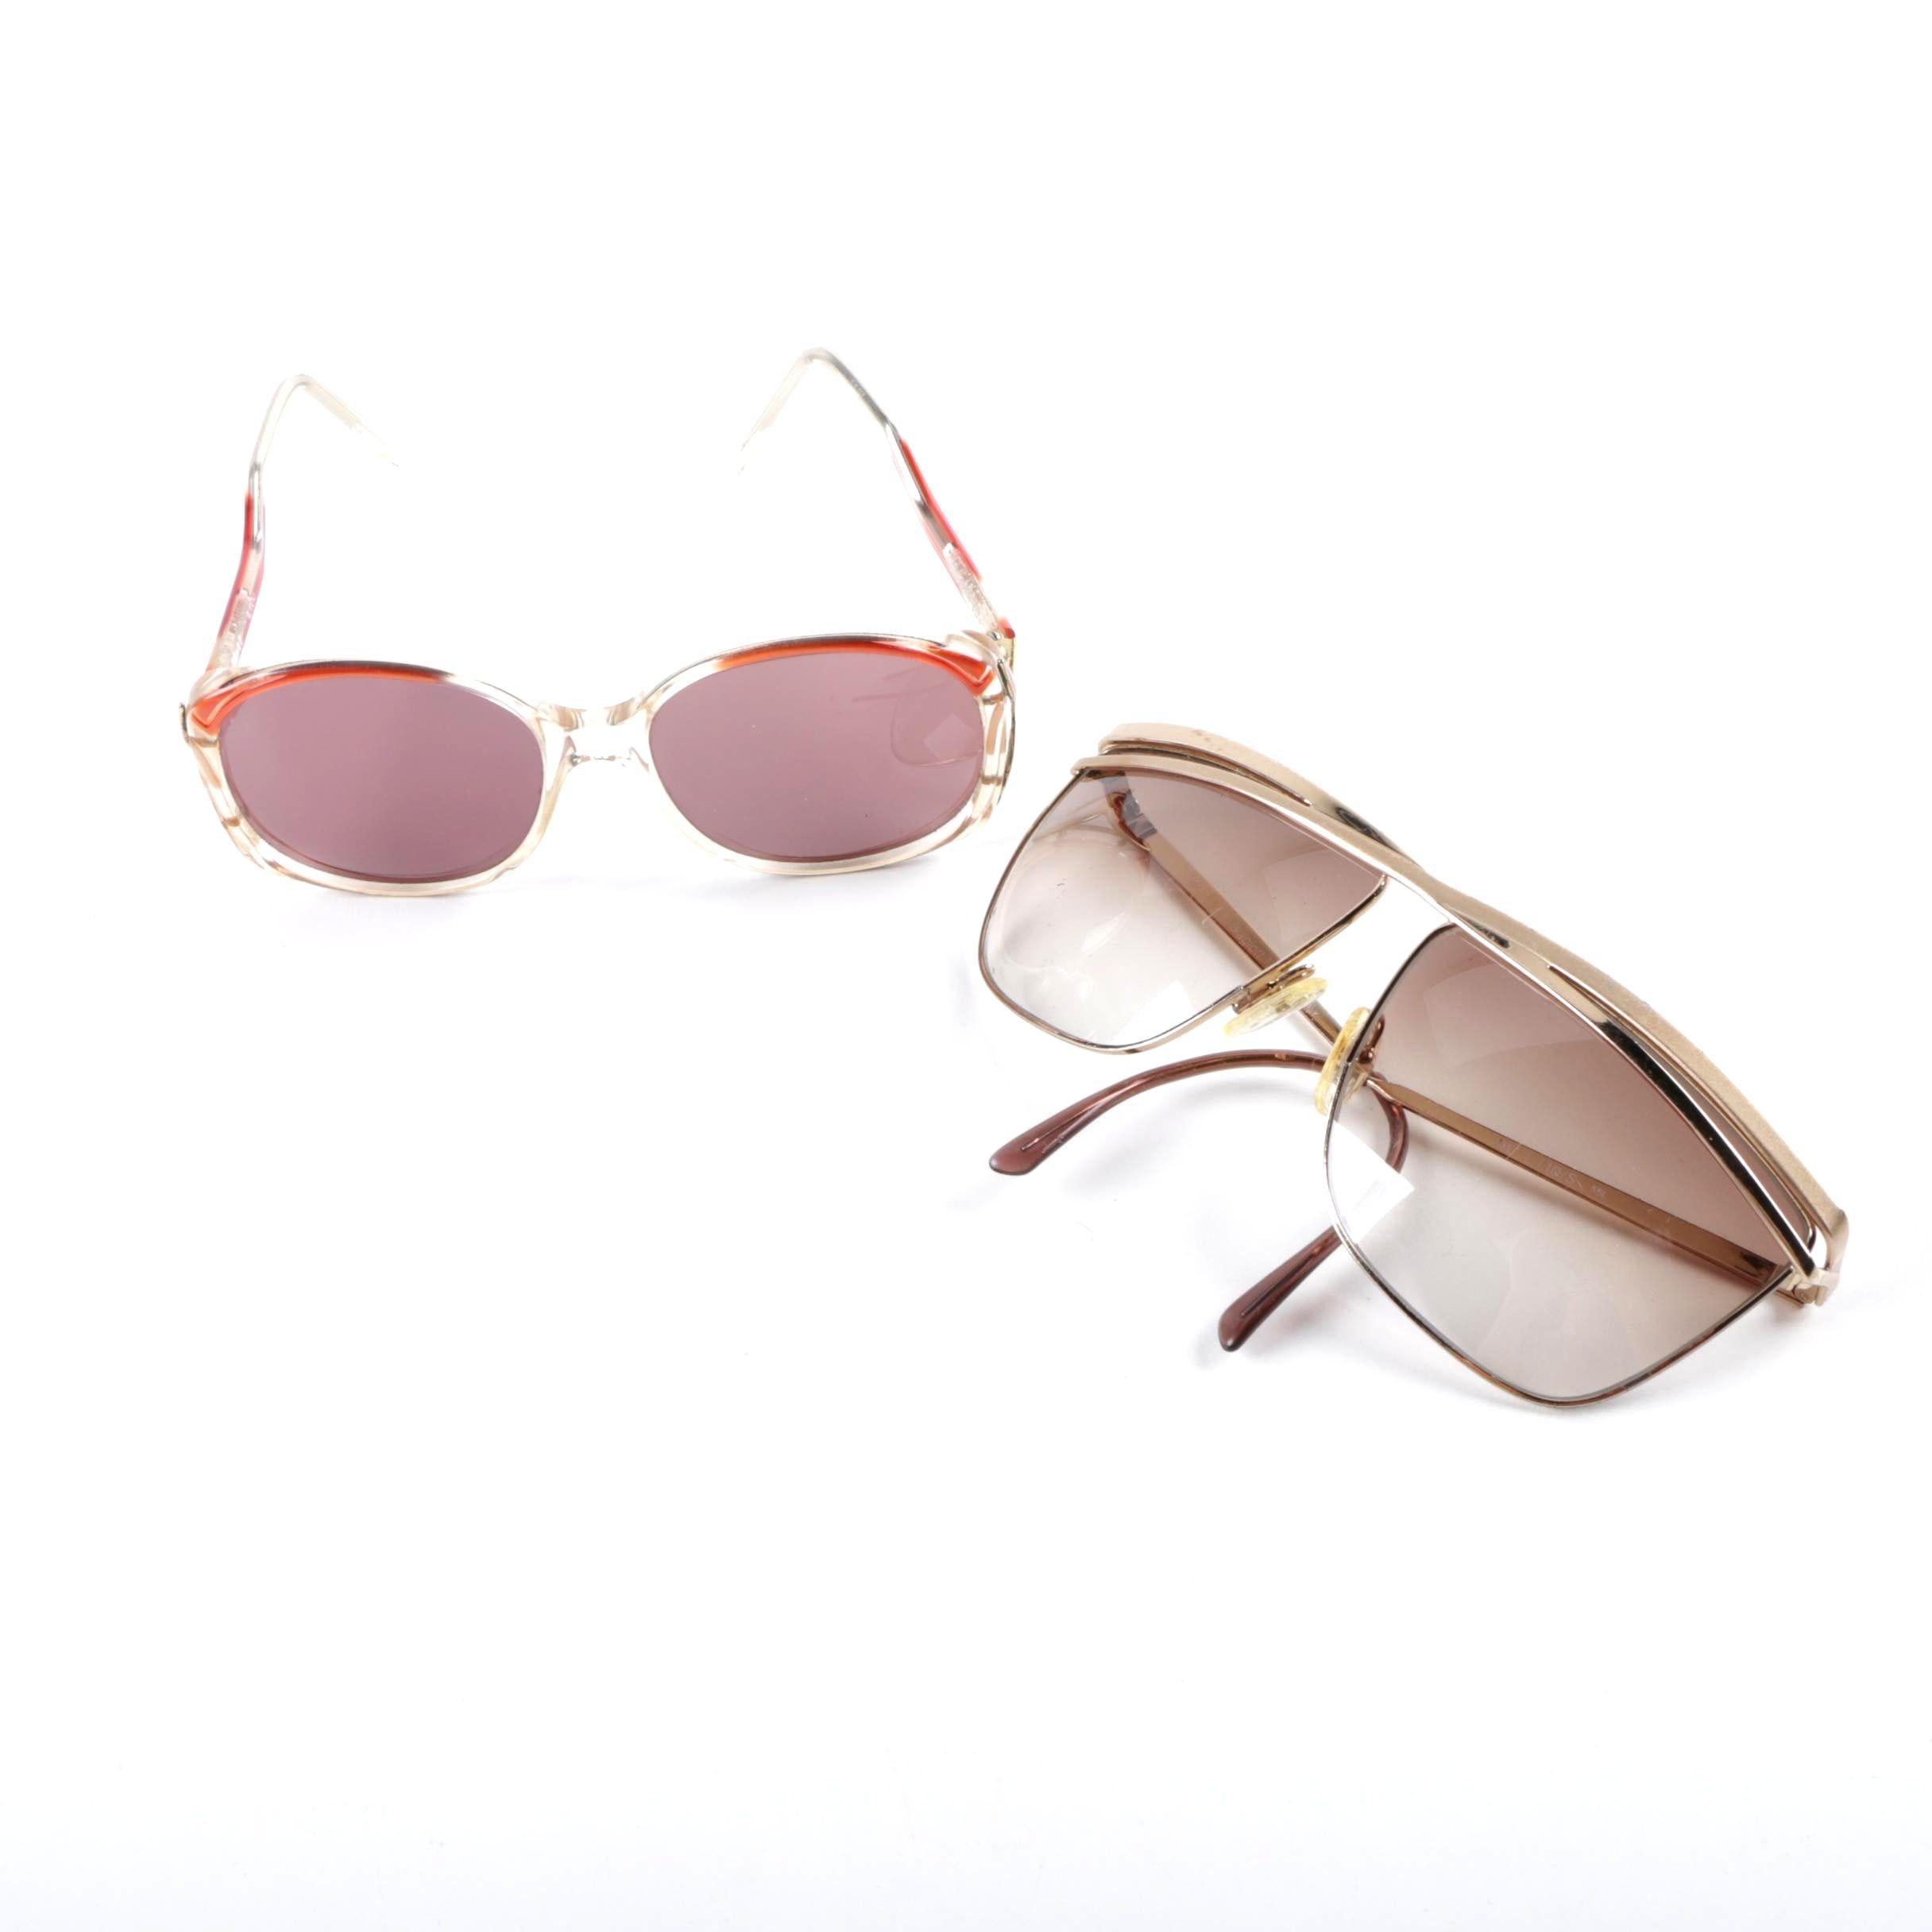 1980s Vintage Laura Biagiotti and Lido Italian Sunglasses